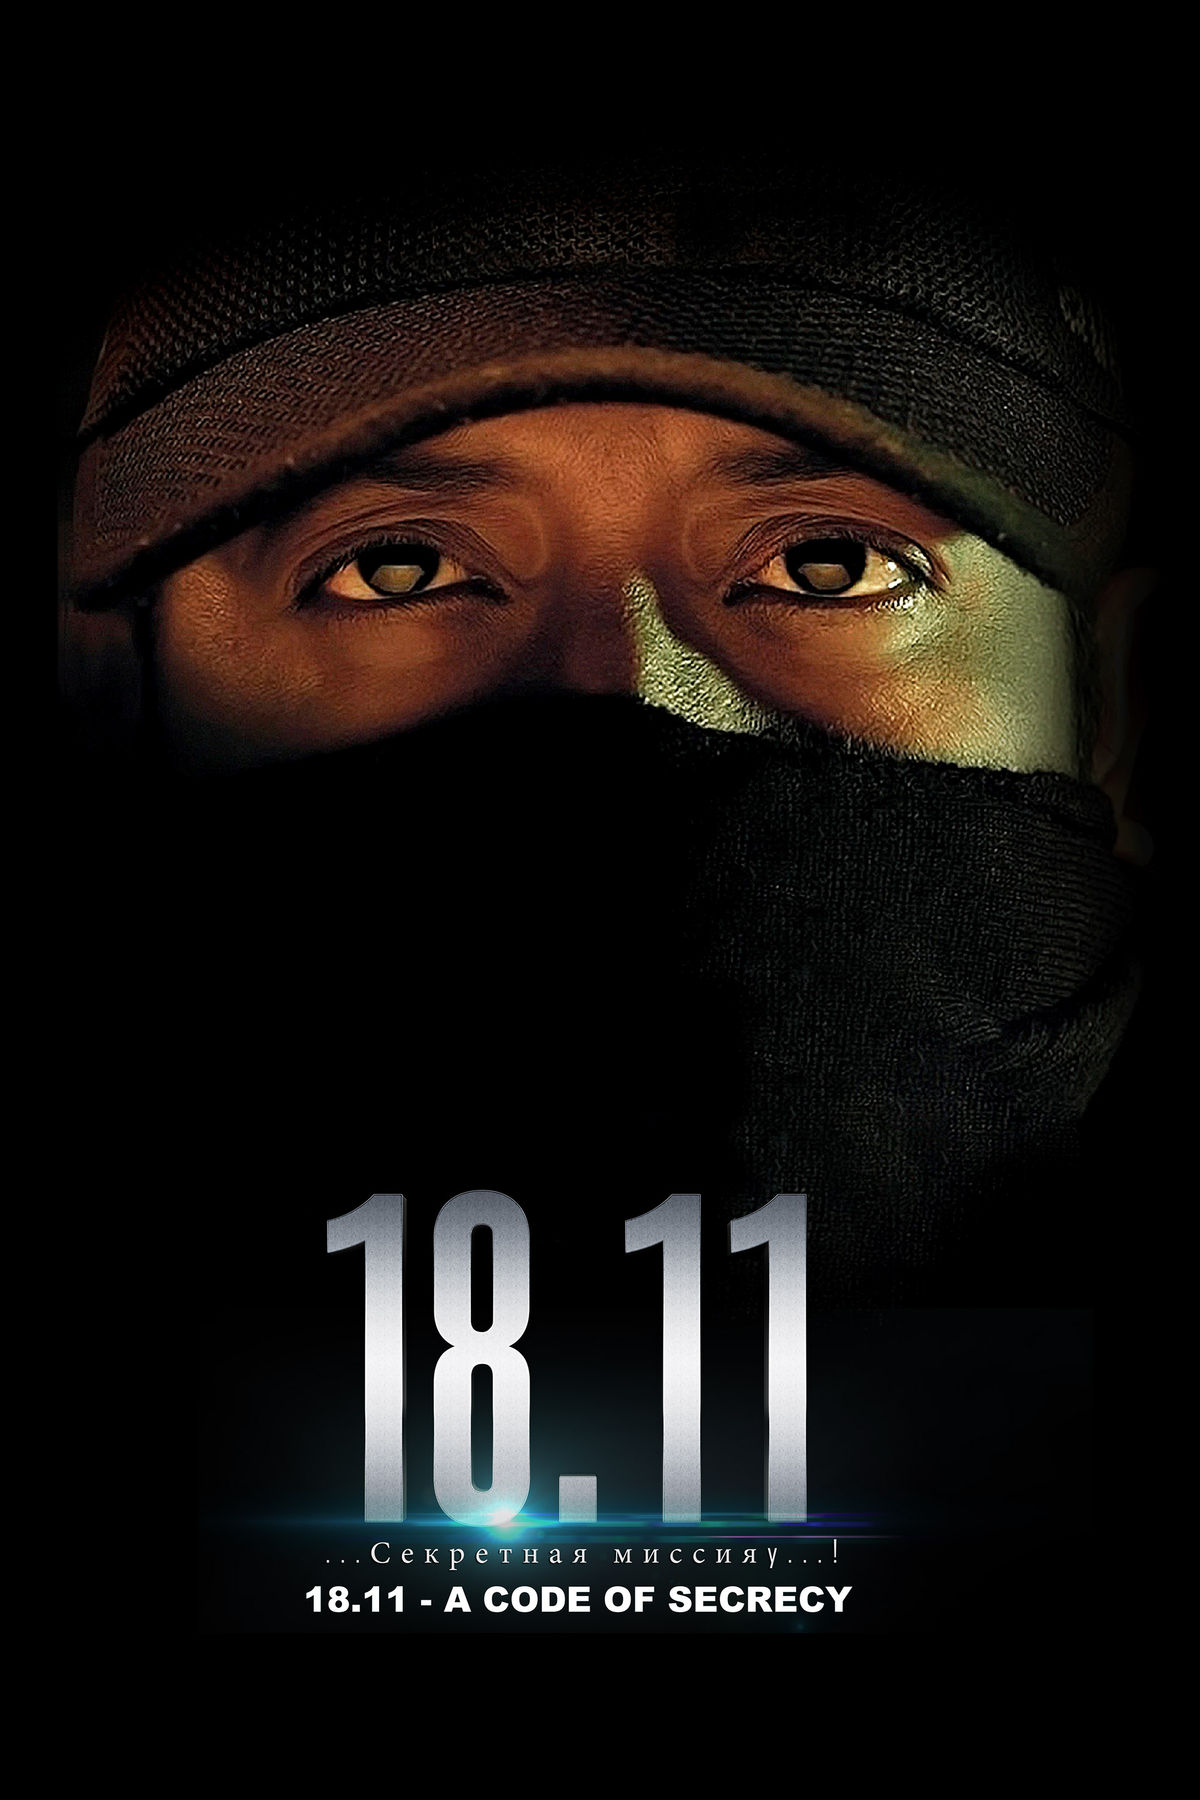 18.11 - A Code of Secrecy - Russian